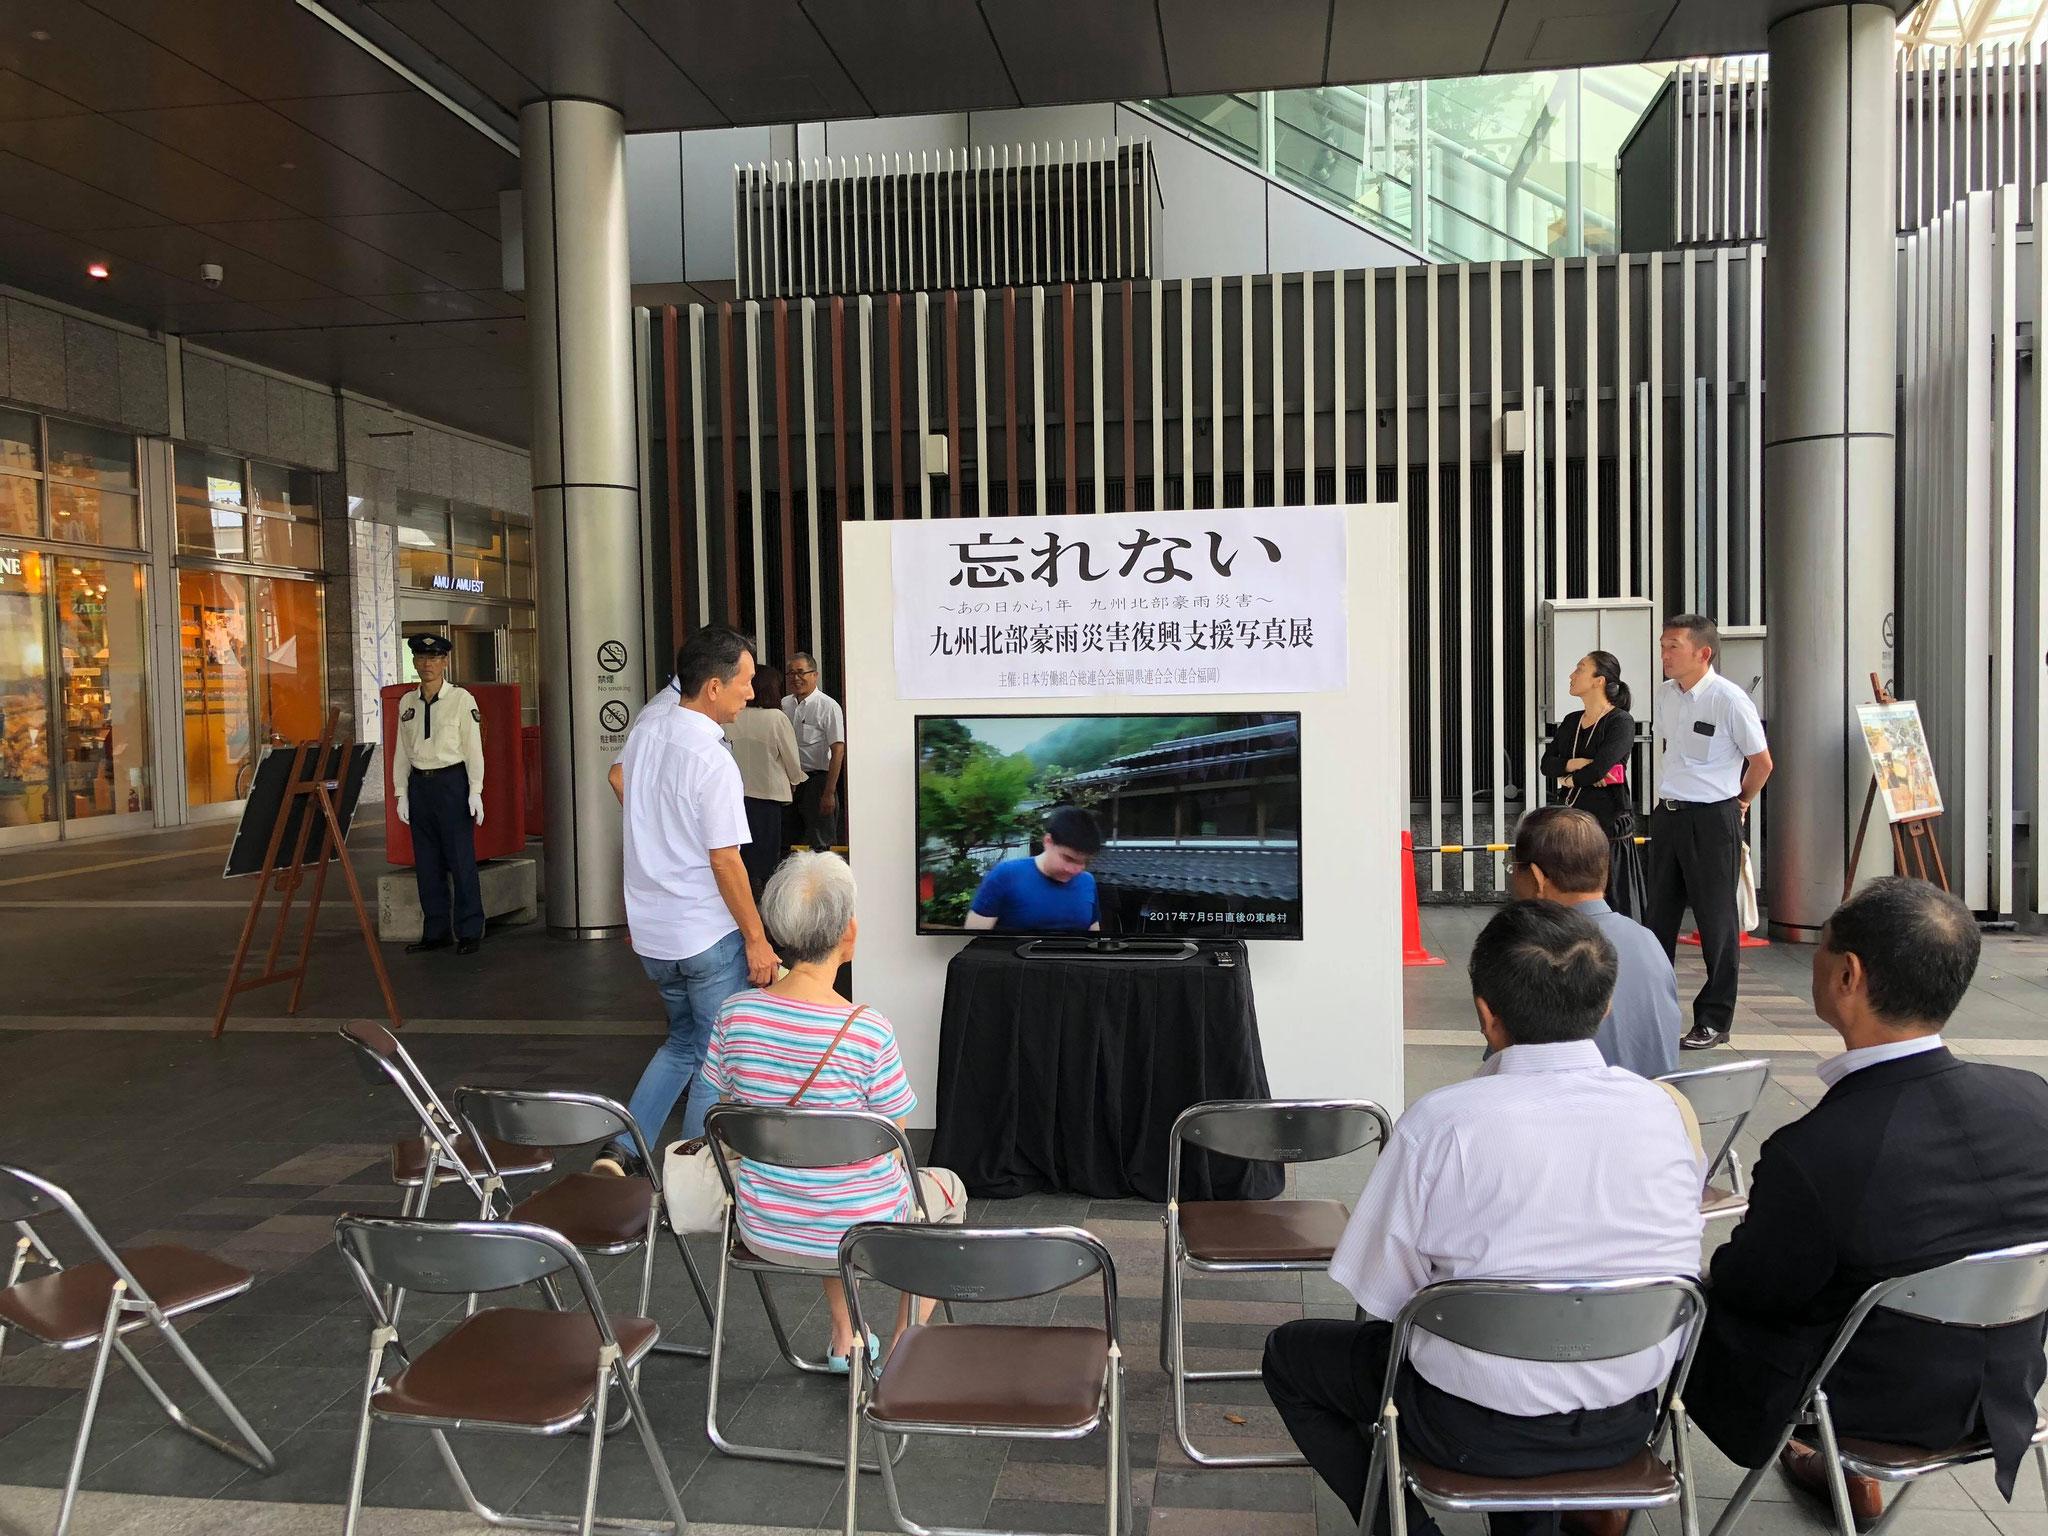 7月5日 九州北部豪雨災害復興支援写真展「忘れない」